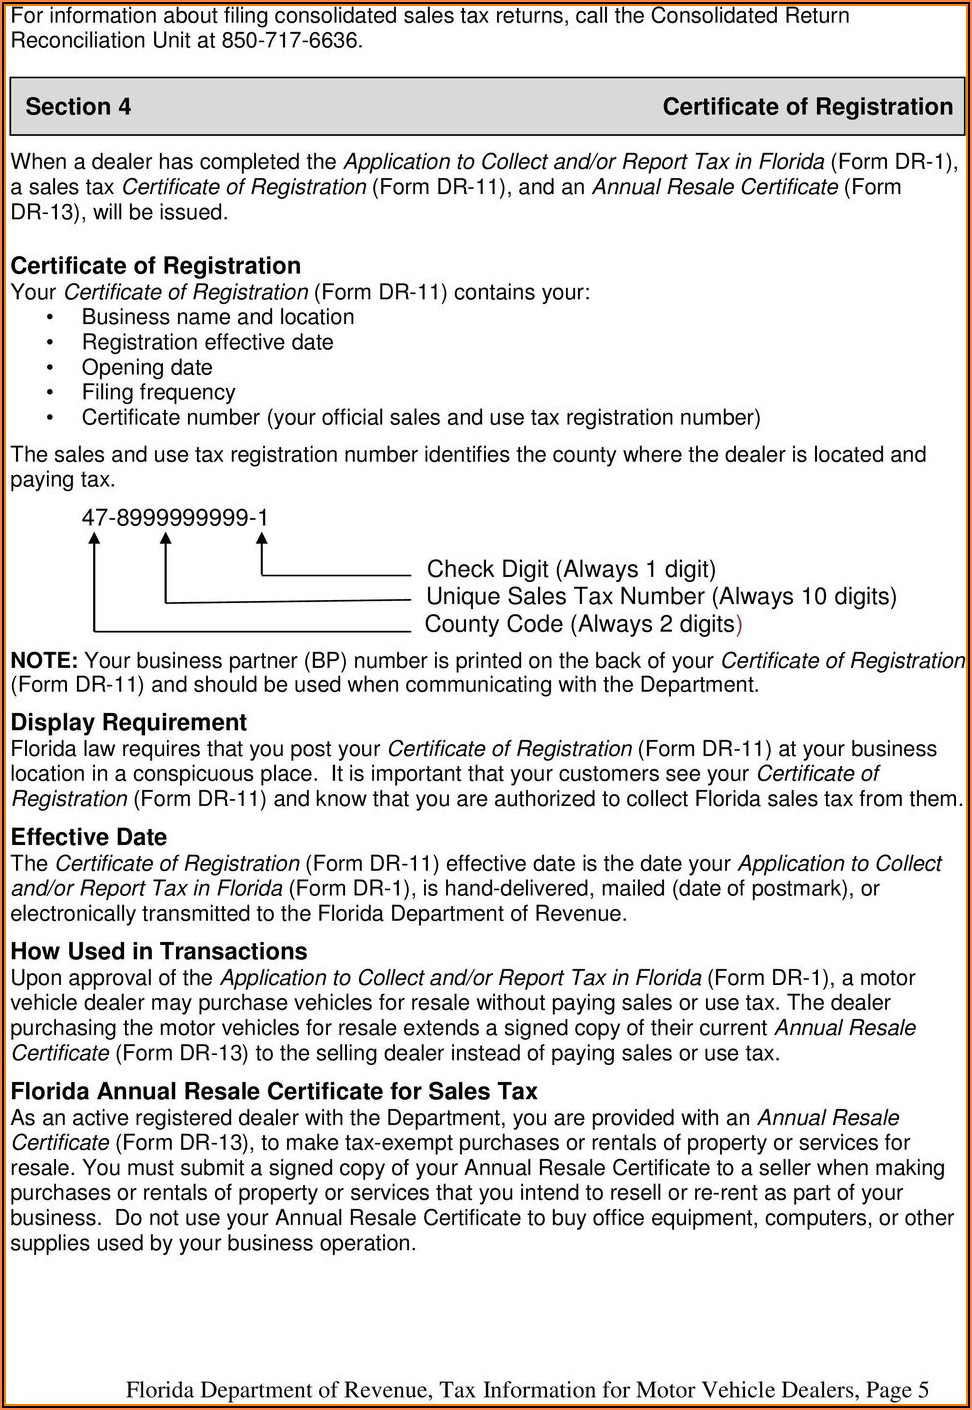 Print Florida Annual Resale Certificate Form Dr 13